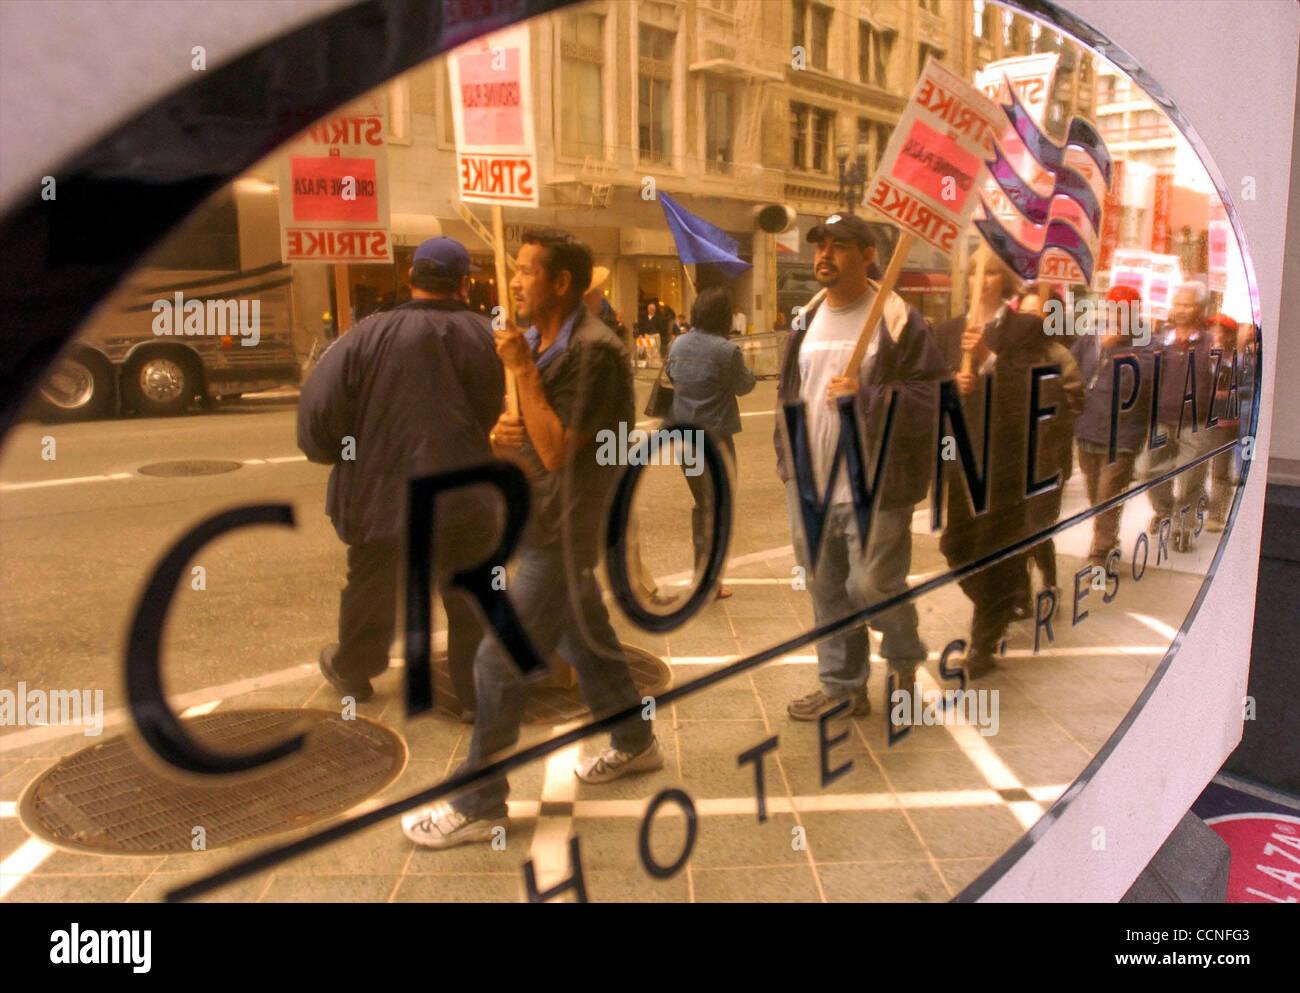 Hotel Workers Strike Stock Photos & Hotel Workers Strike Stock ...